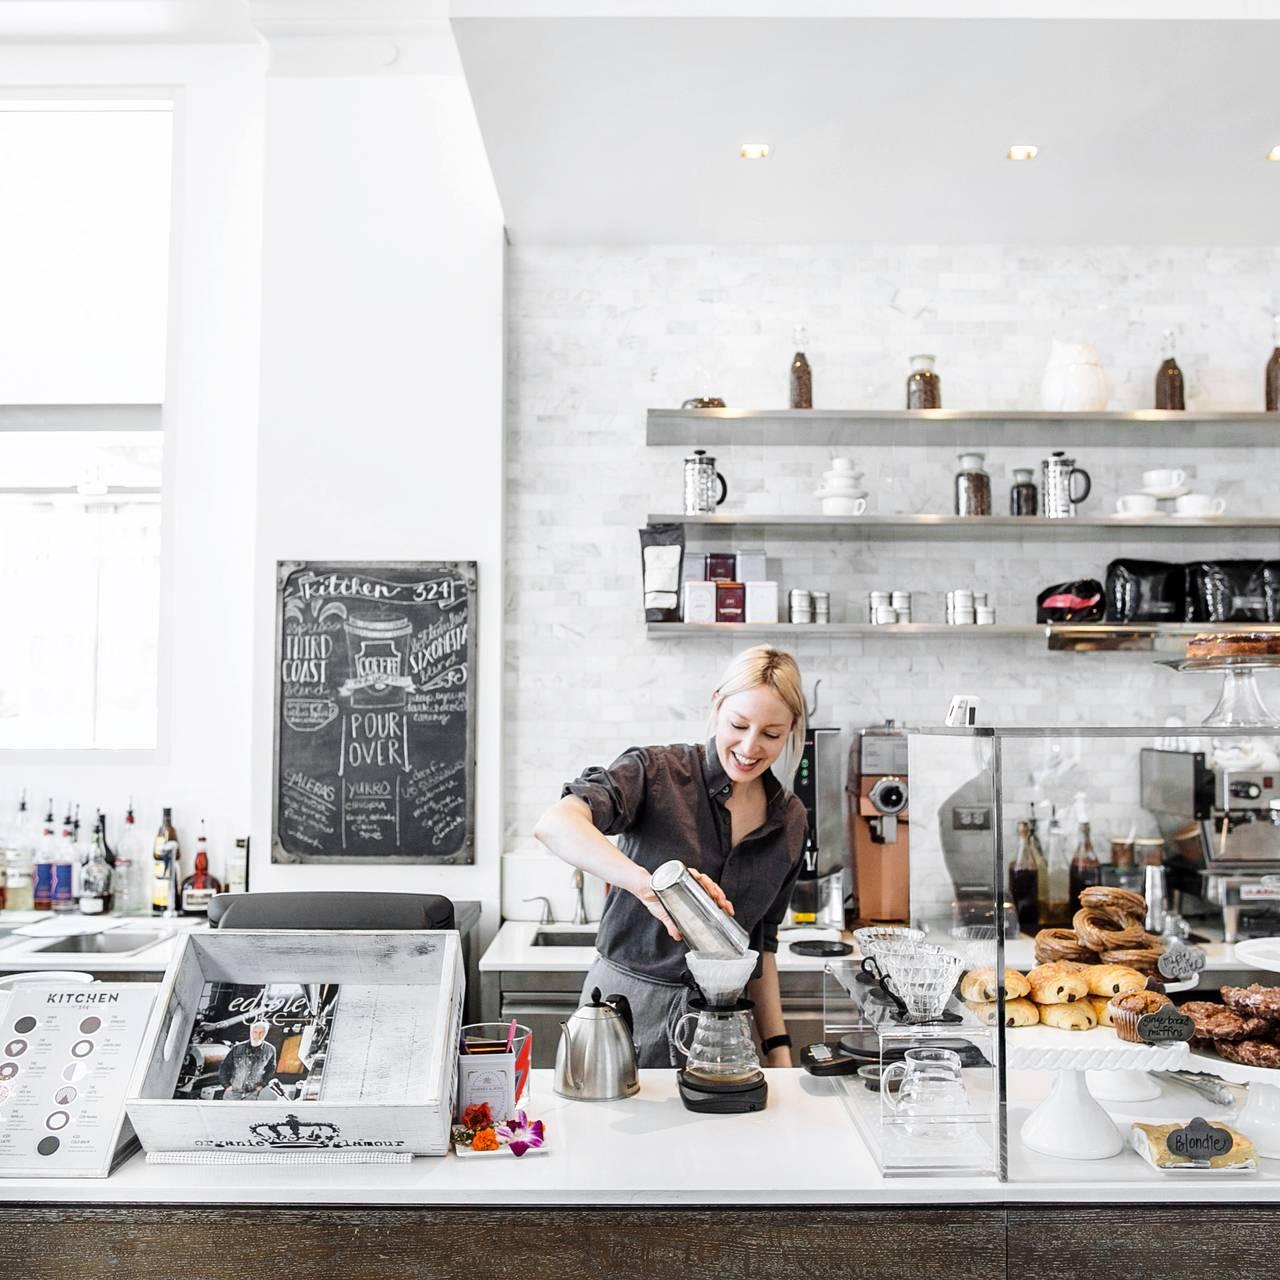 Kitchen No. 324 Restaurant - Oklahoma City, OK | OpenTable